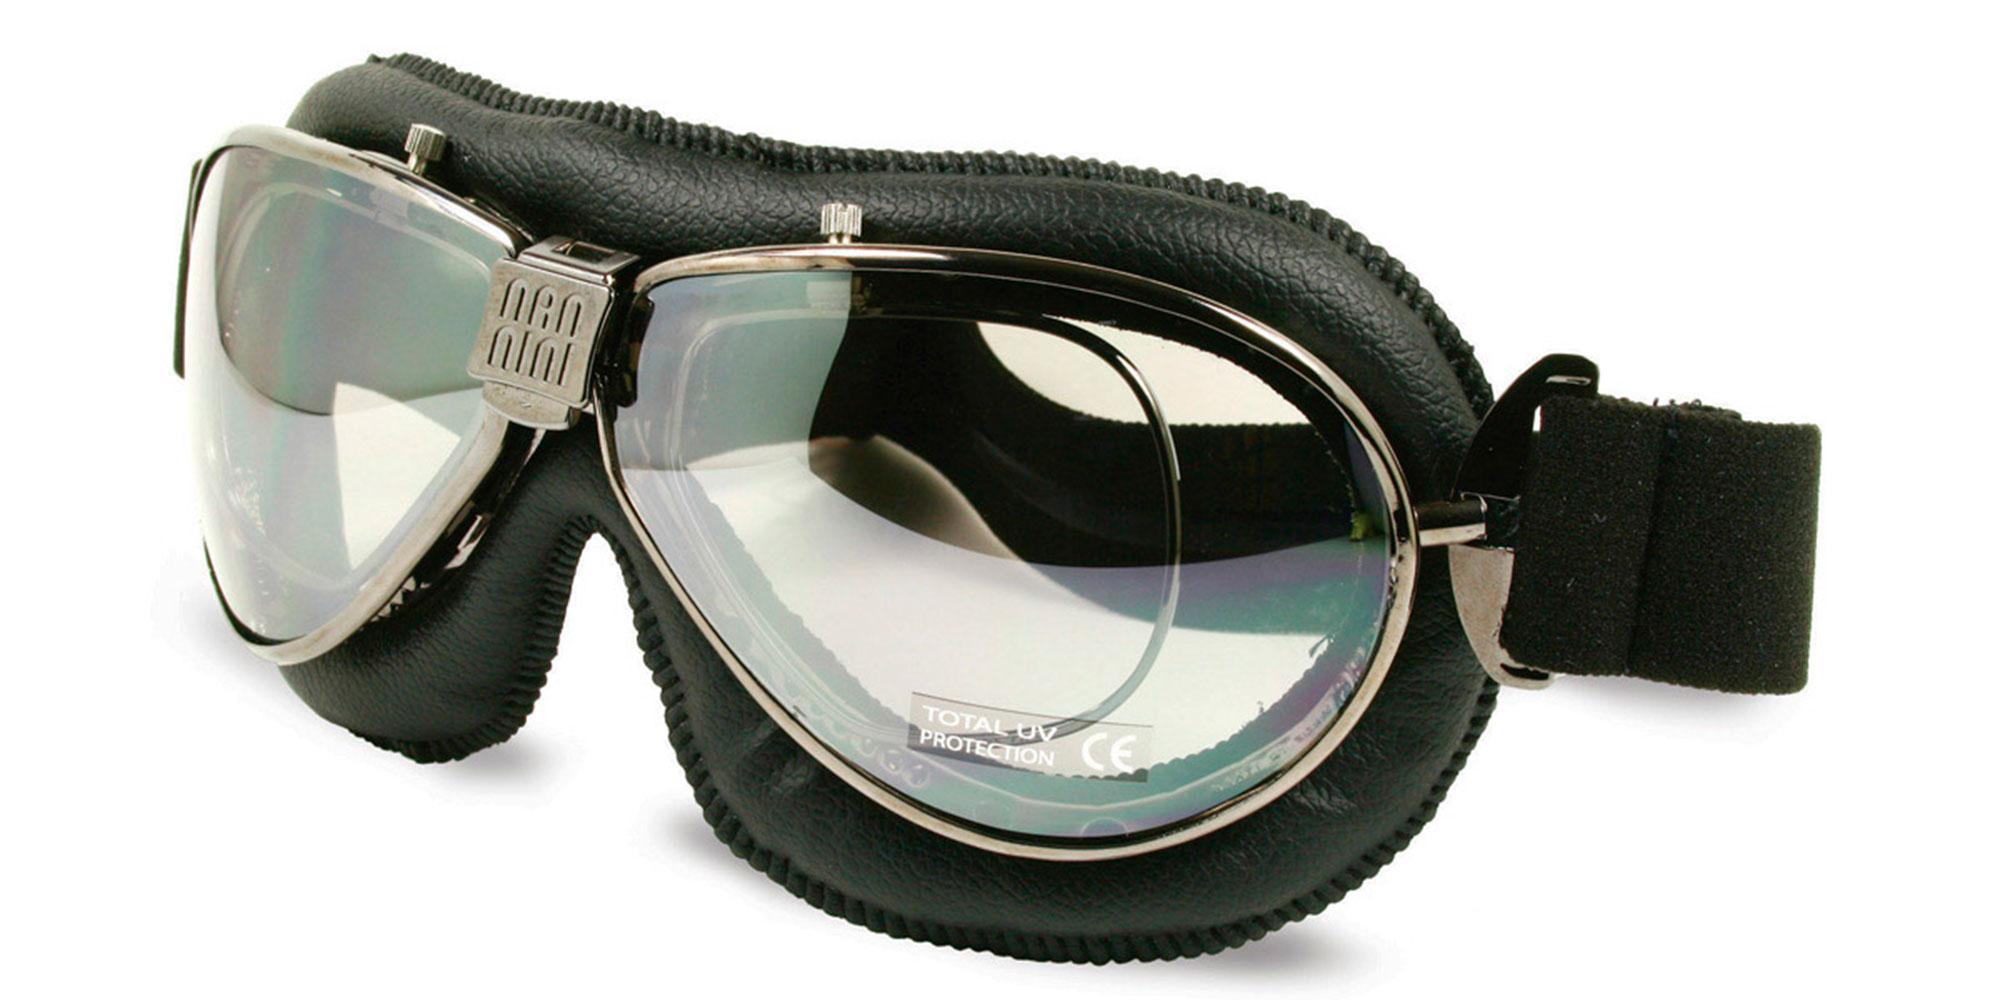 Black/Chrome TT Goggles, Sports Eyewear